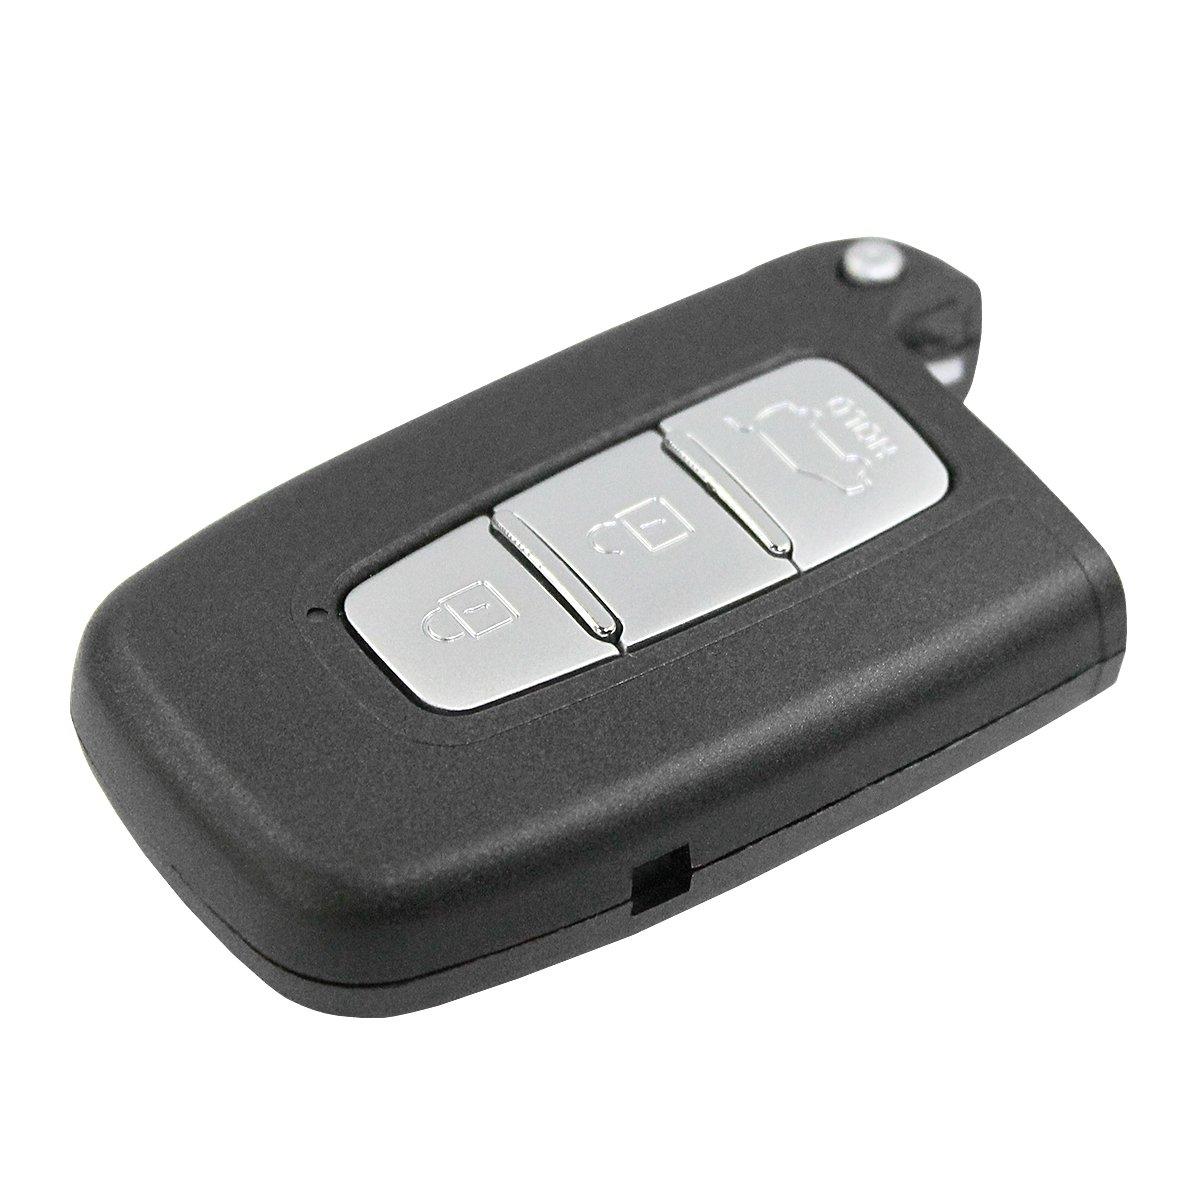 Carcasa Llave Carcasa Mando Negro 3 Botones Sin Hoja Hyundai ...